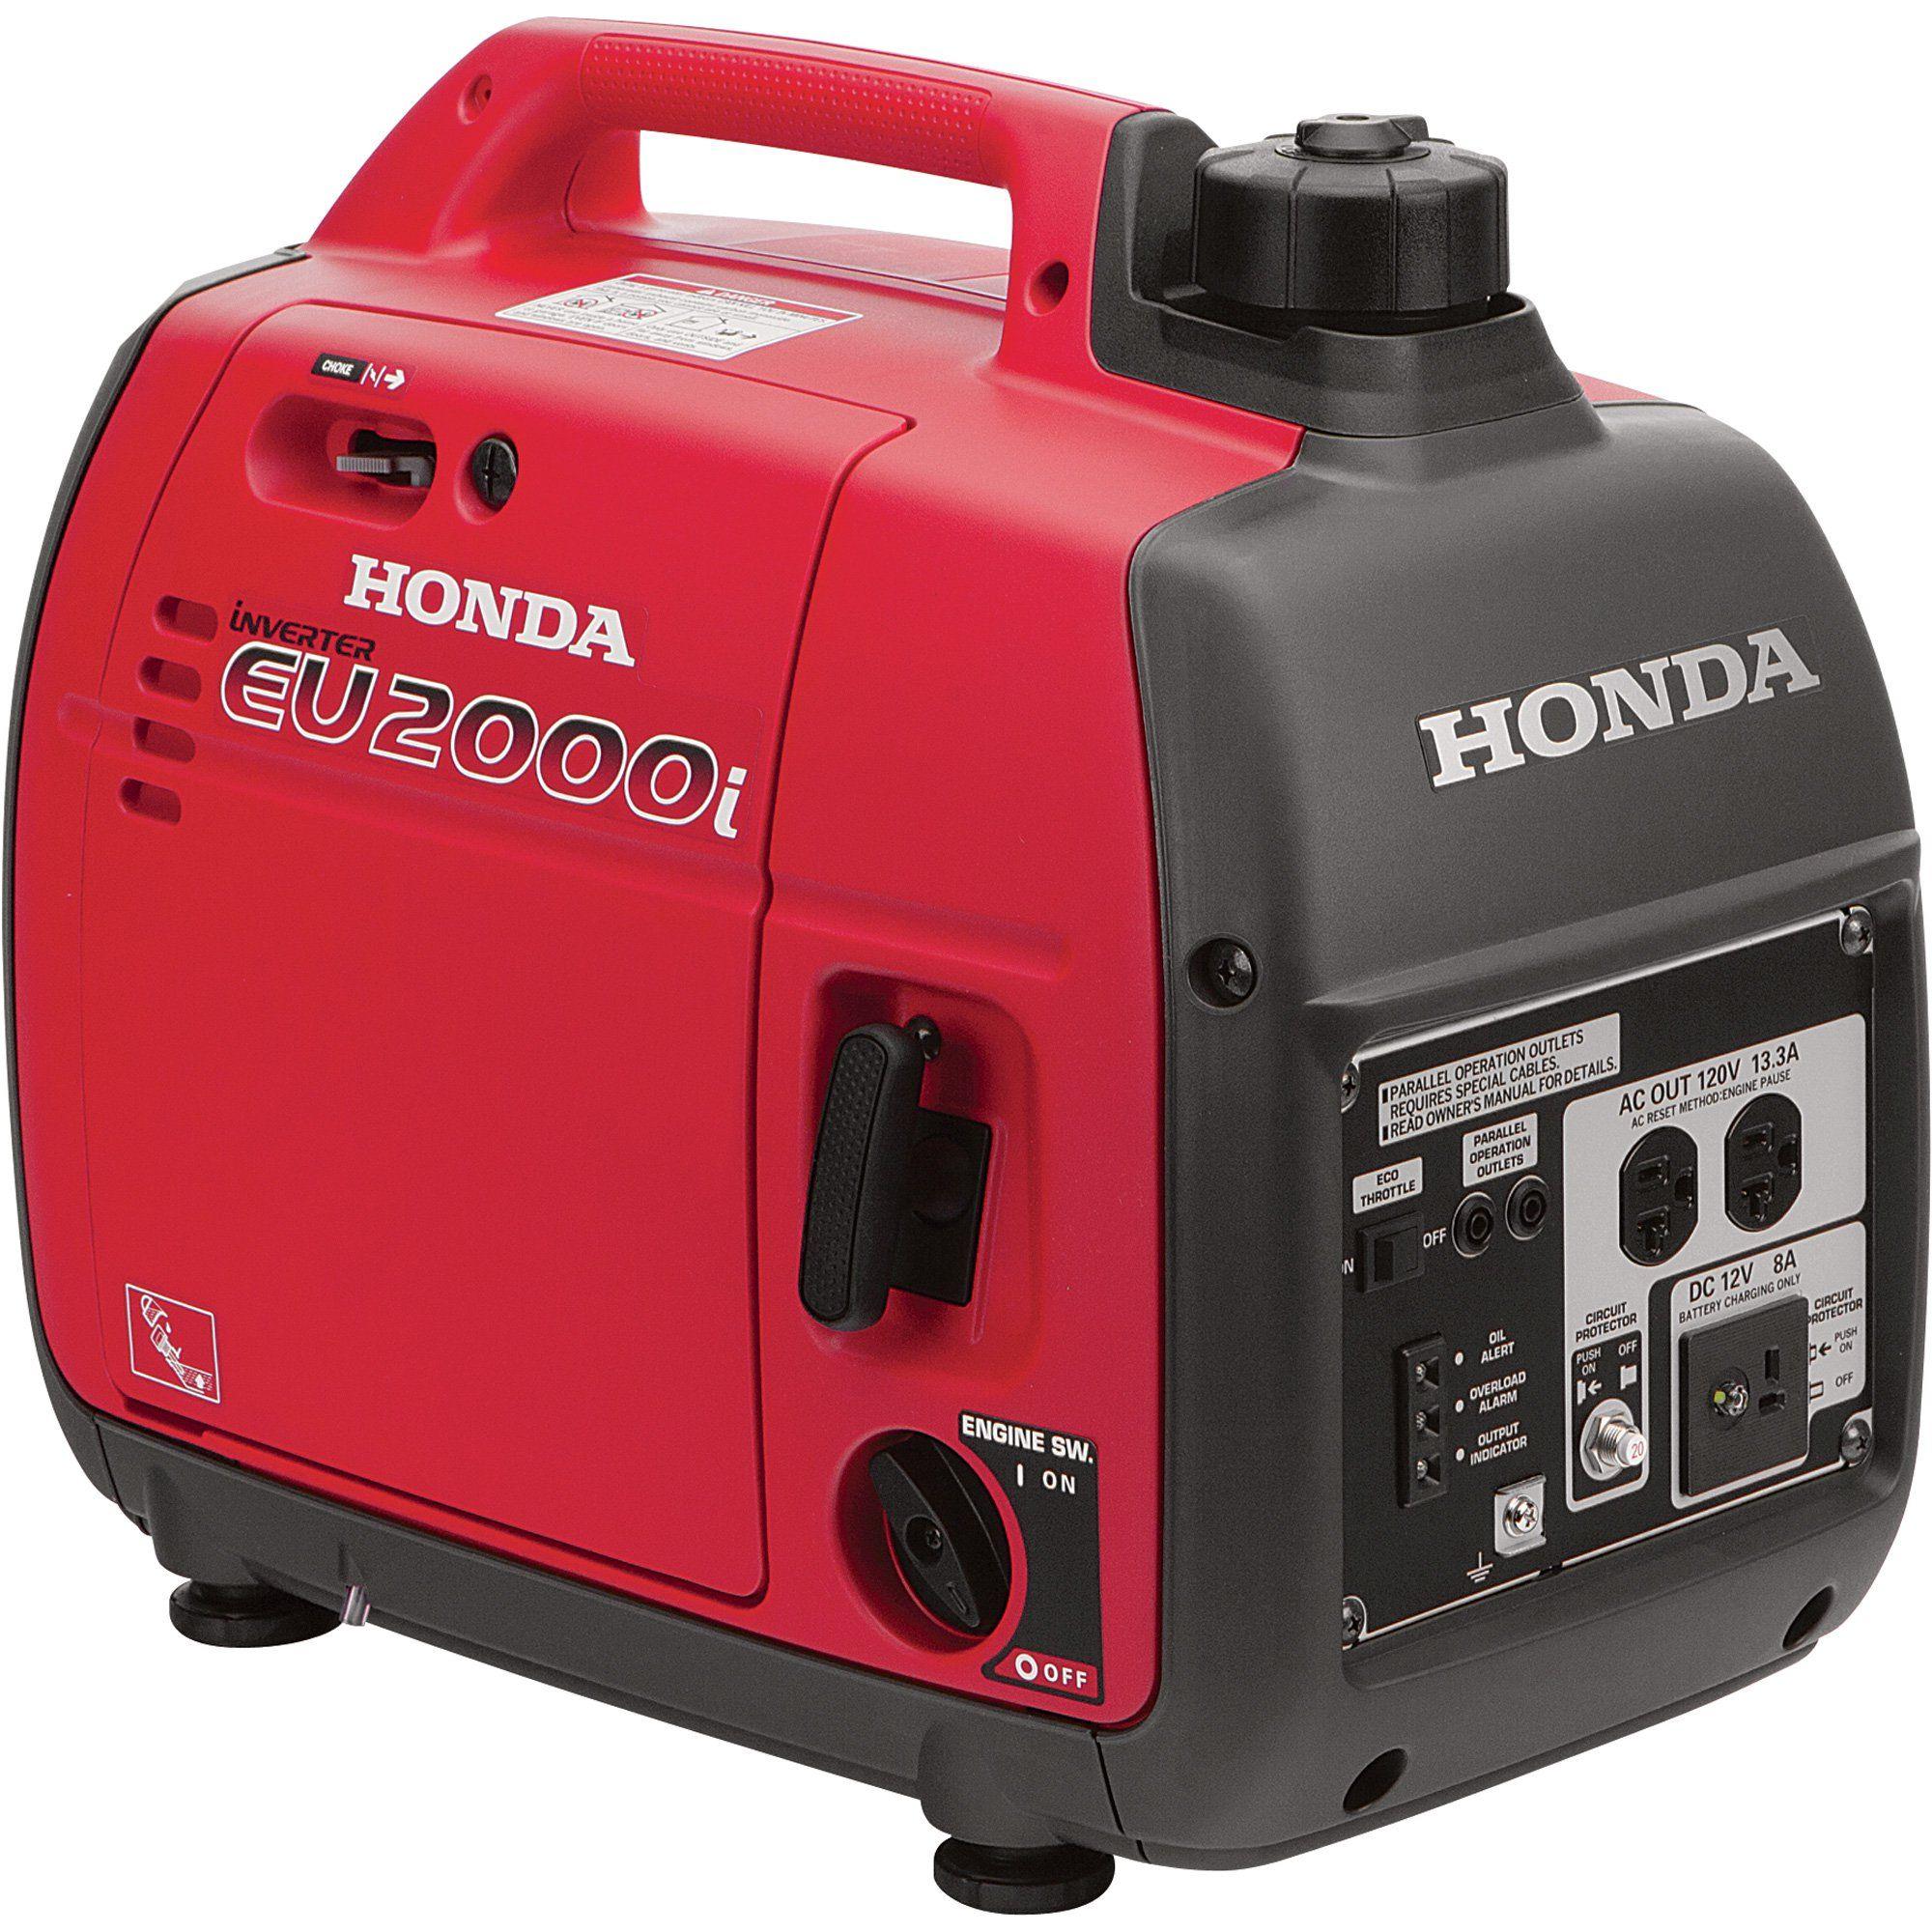 Honda Eu2200i 1800 Watt Gas Powered Portable Inverter Generator